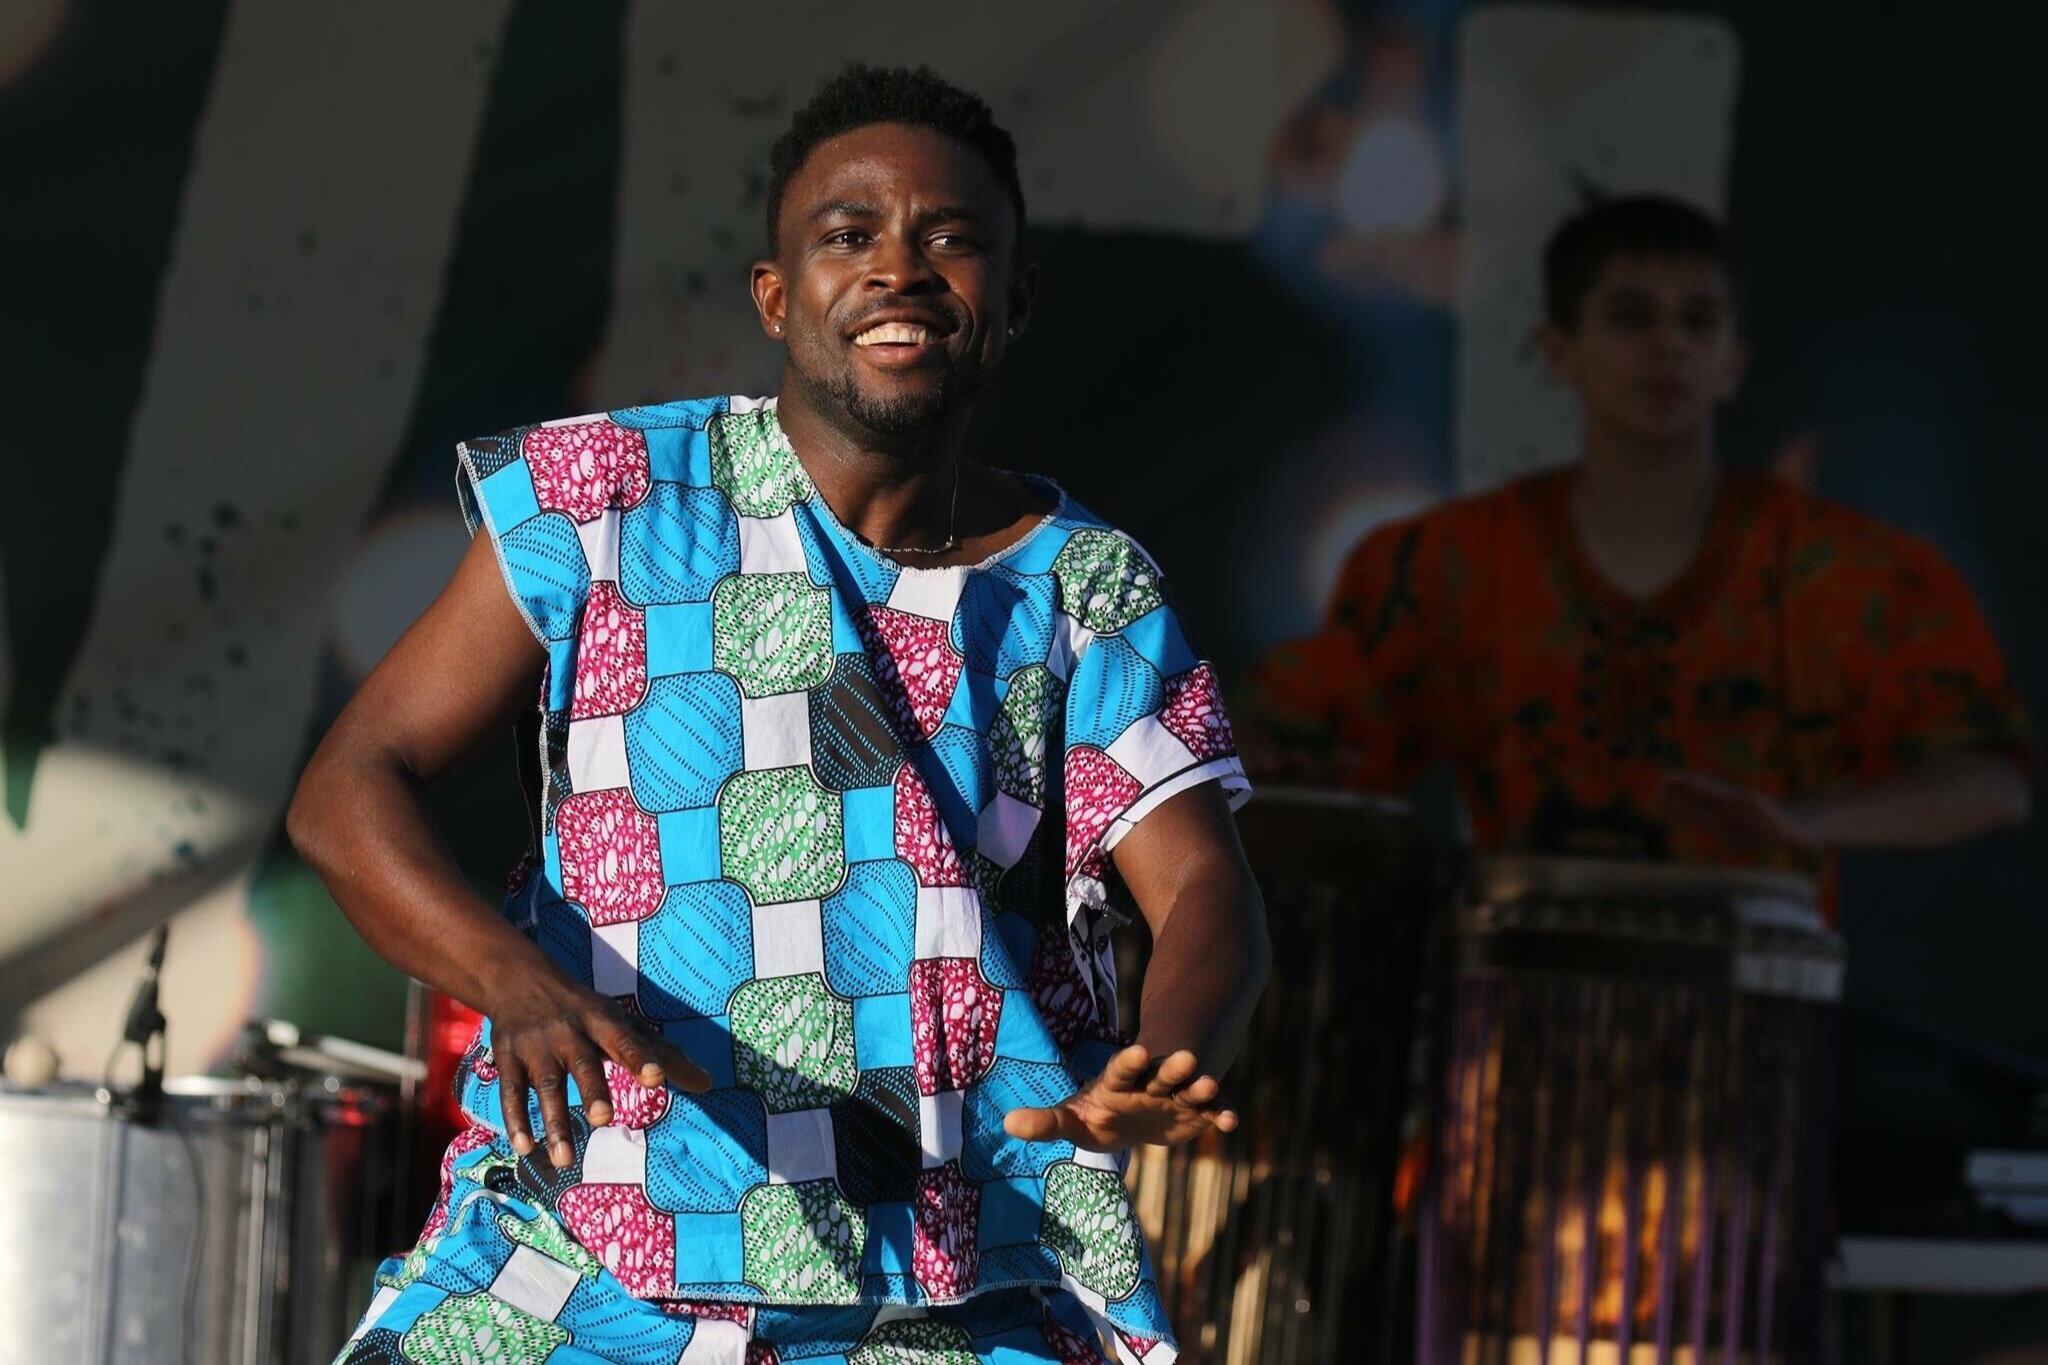 DANCER/PERFORMER: LOUBAYI